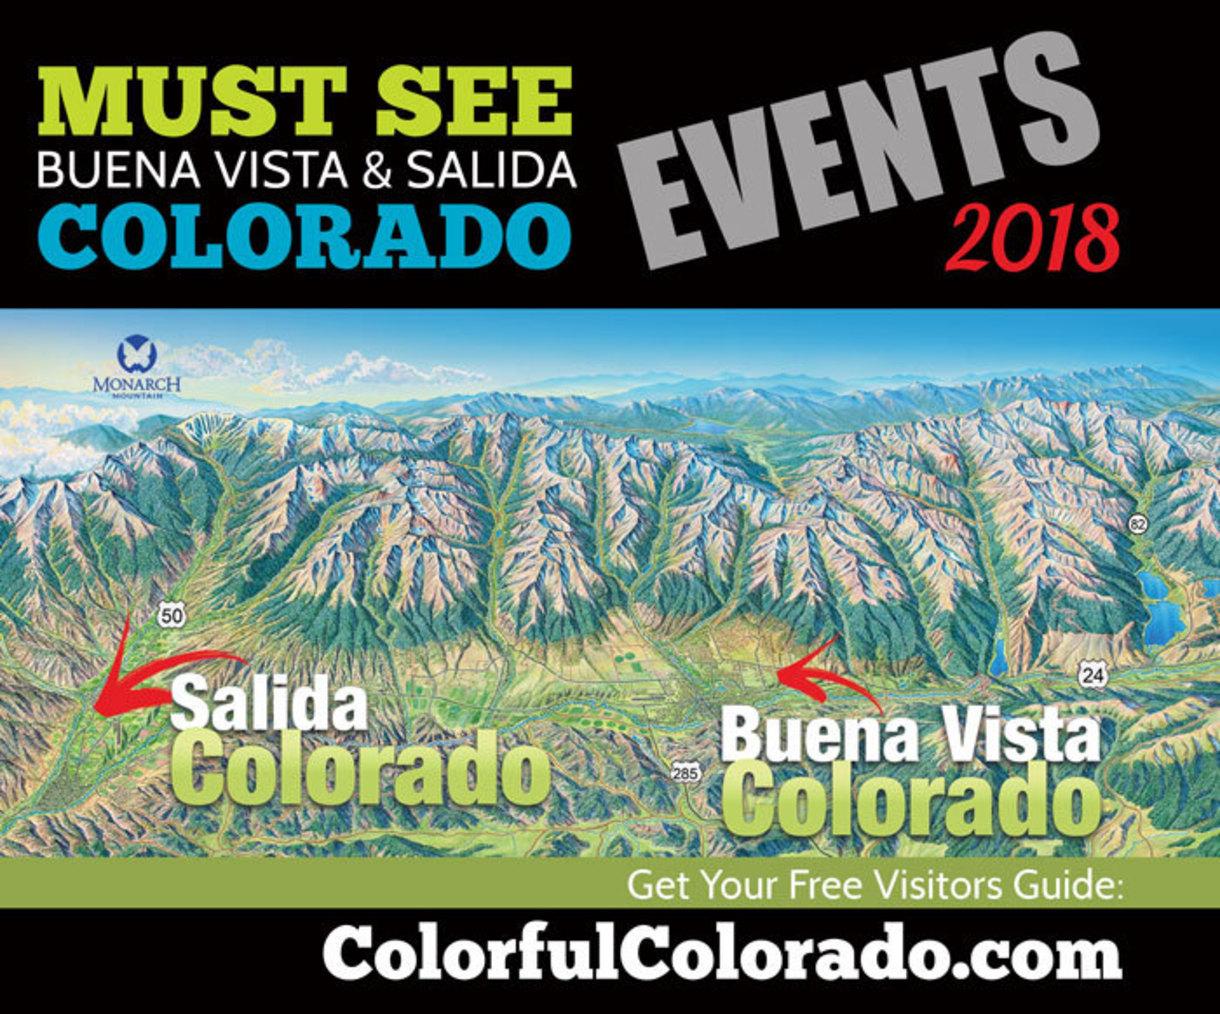 Must See Colorado Events